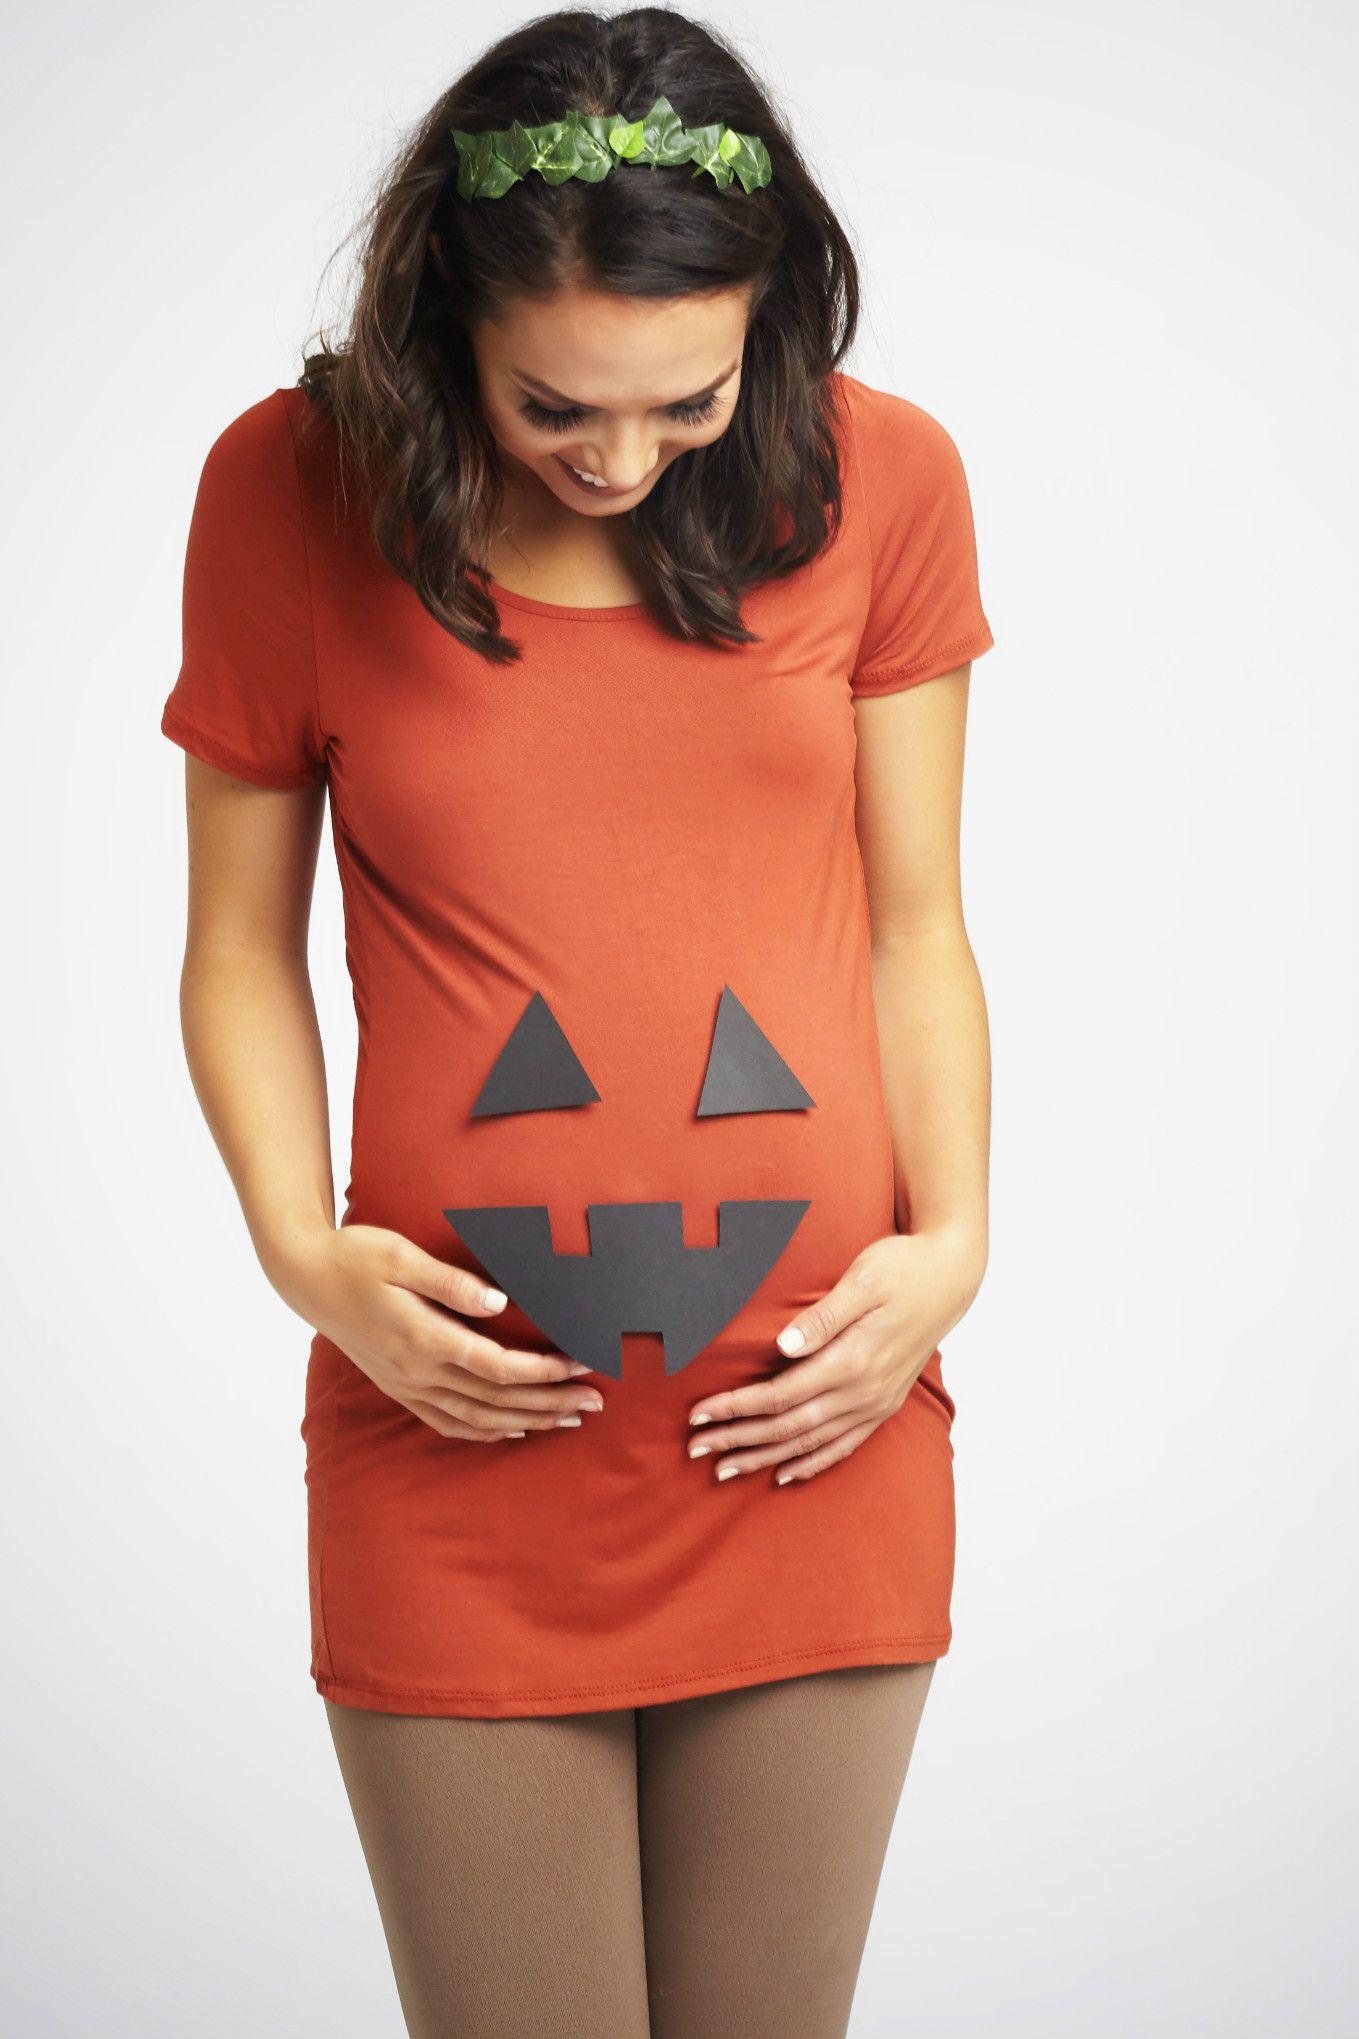 6cc62051a3b DIY Pumpkin Maternity Costume for a simple